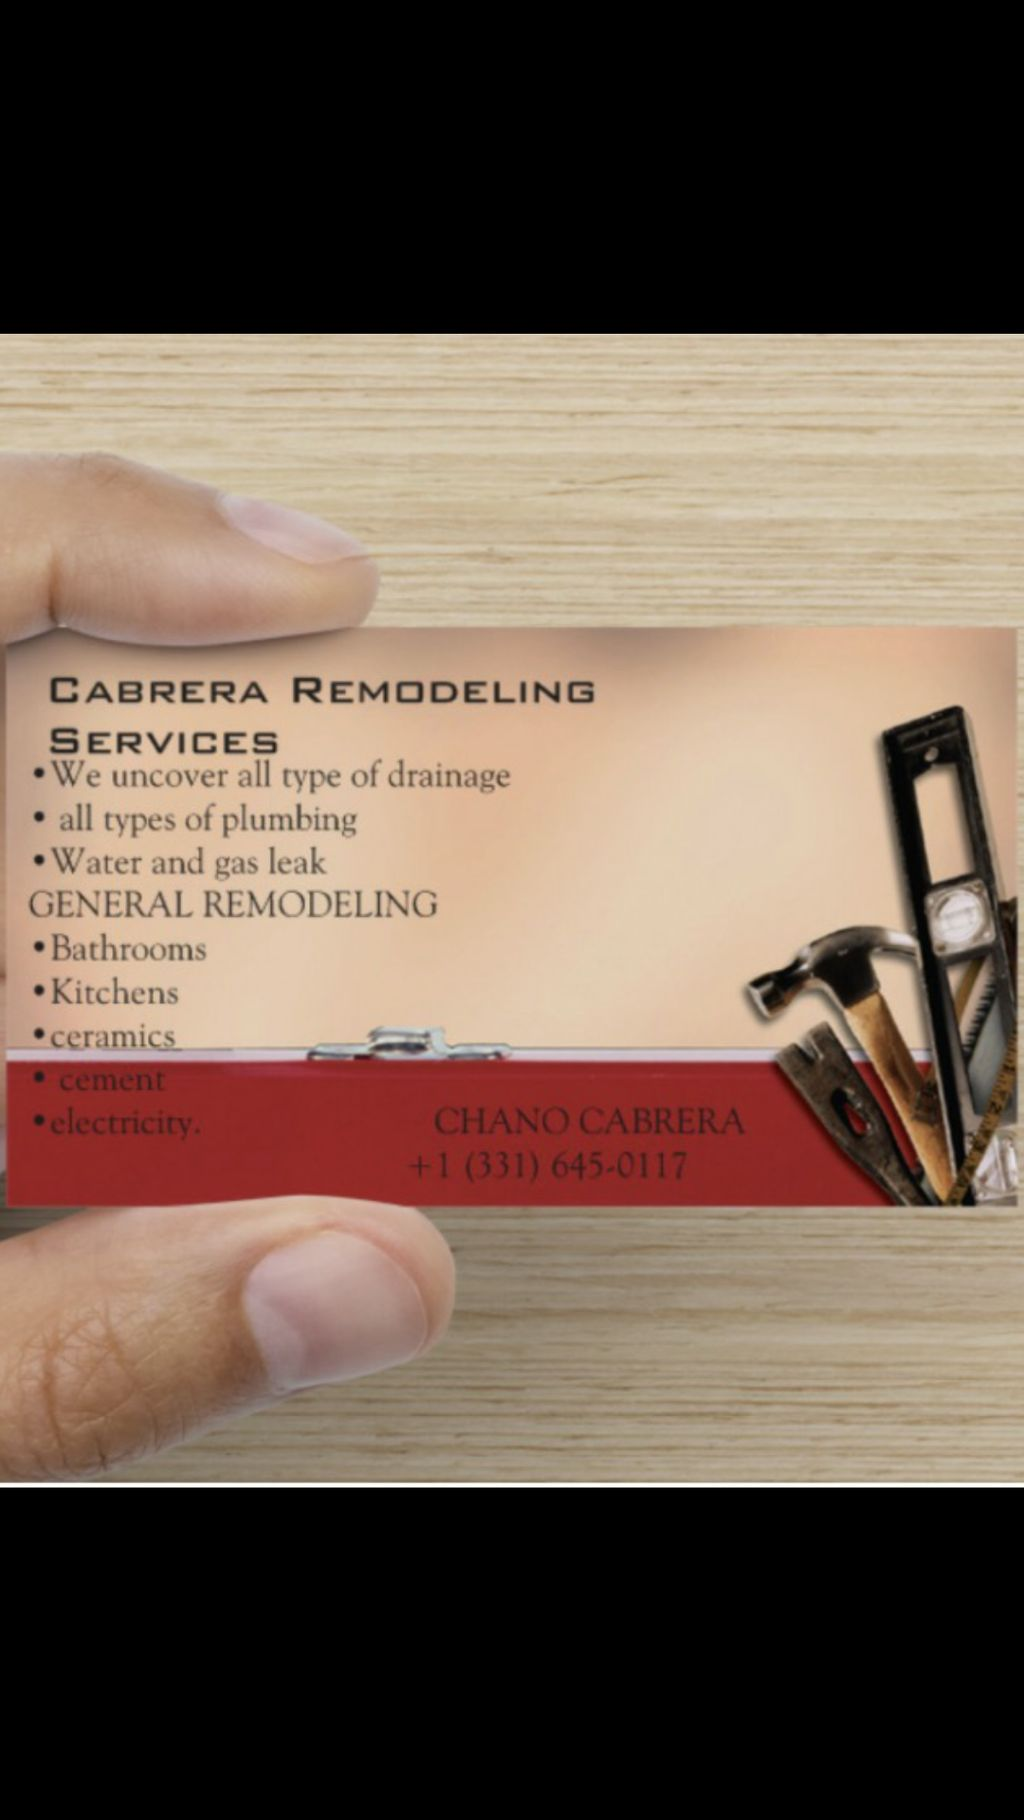 cabrera remodeling services